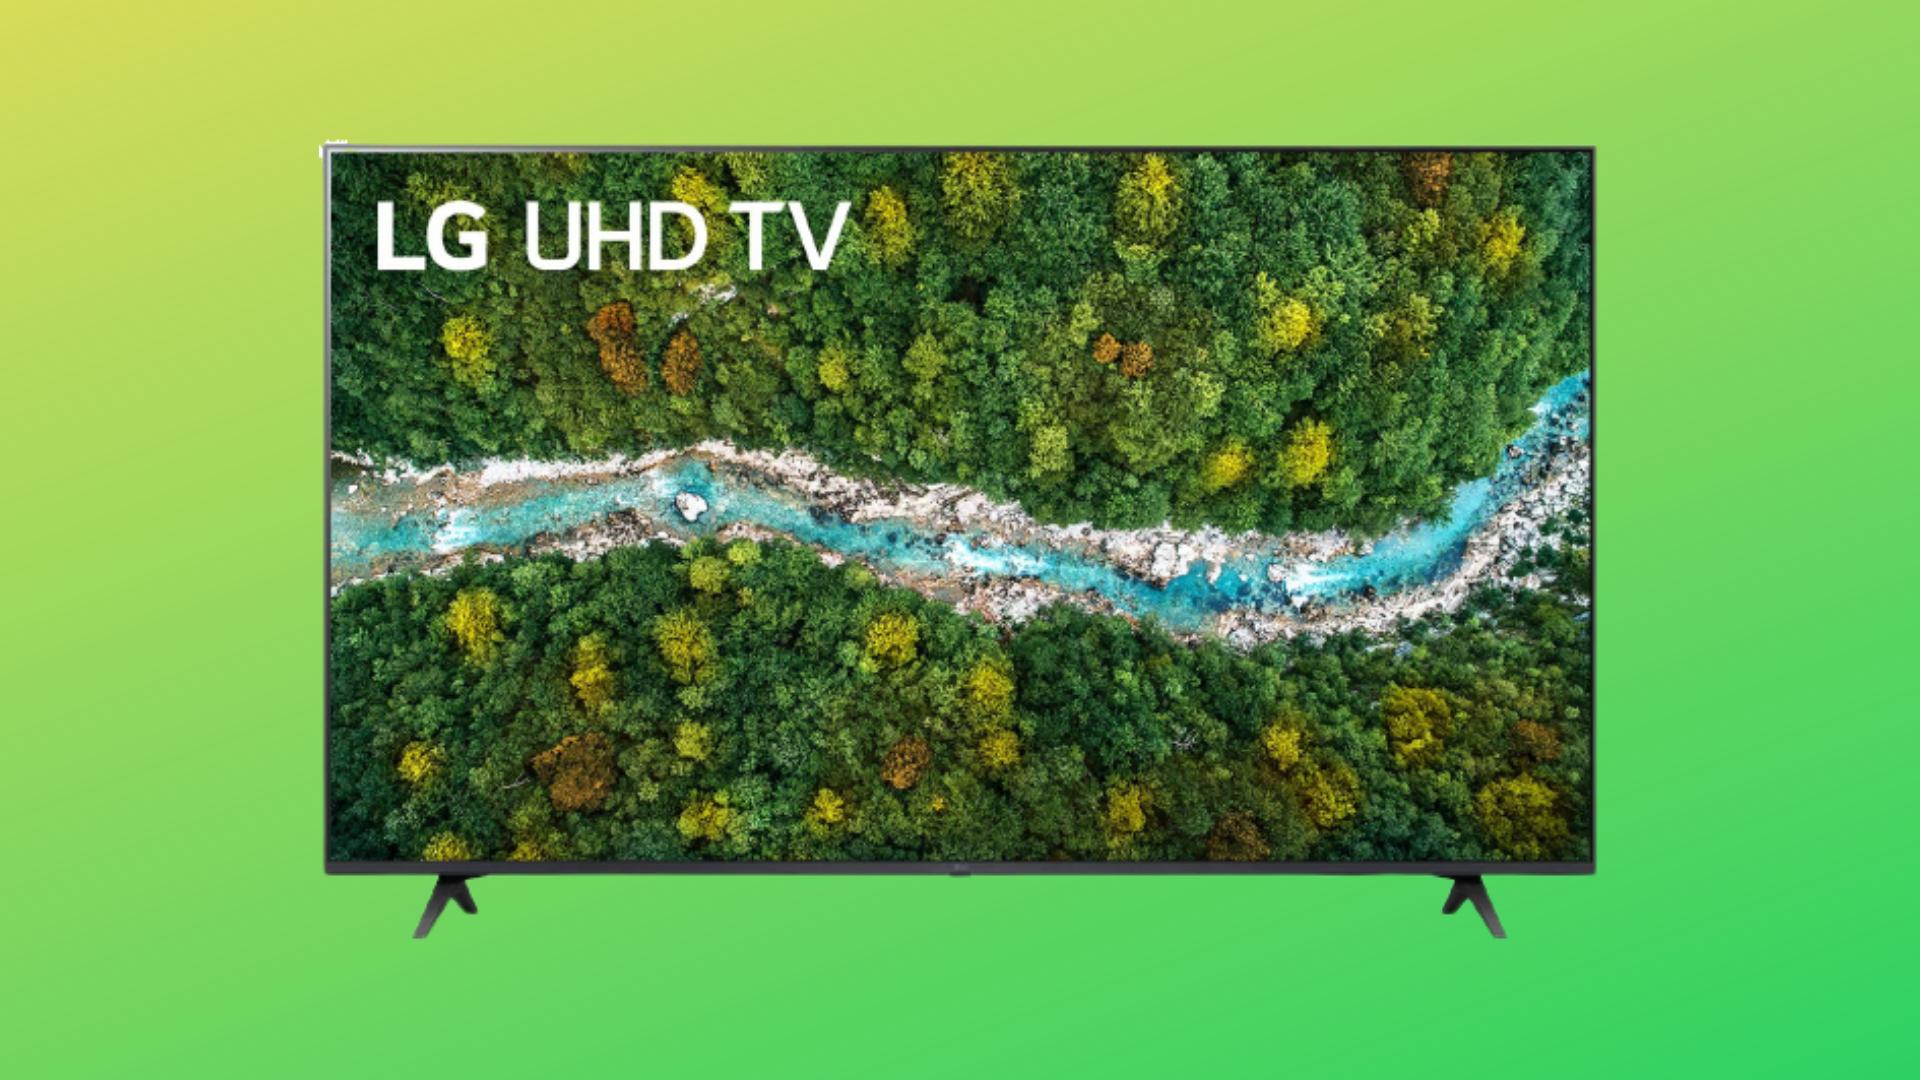 LG UHD 4K 2021 in offerta su Amazon: Smart TV nuovissimo già in sconto - image  on https://www.zxbyte.com